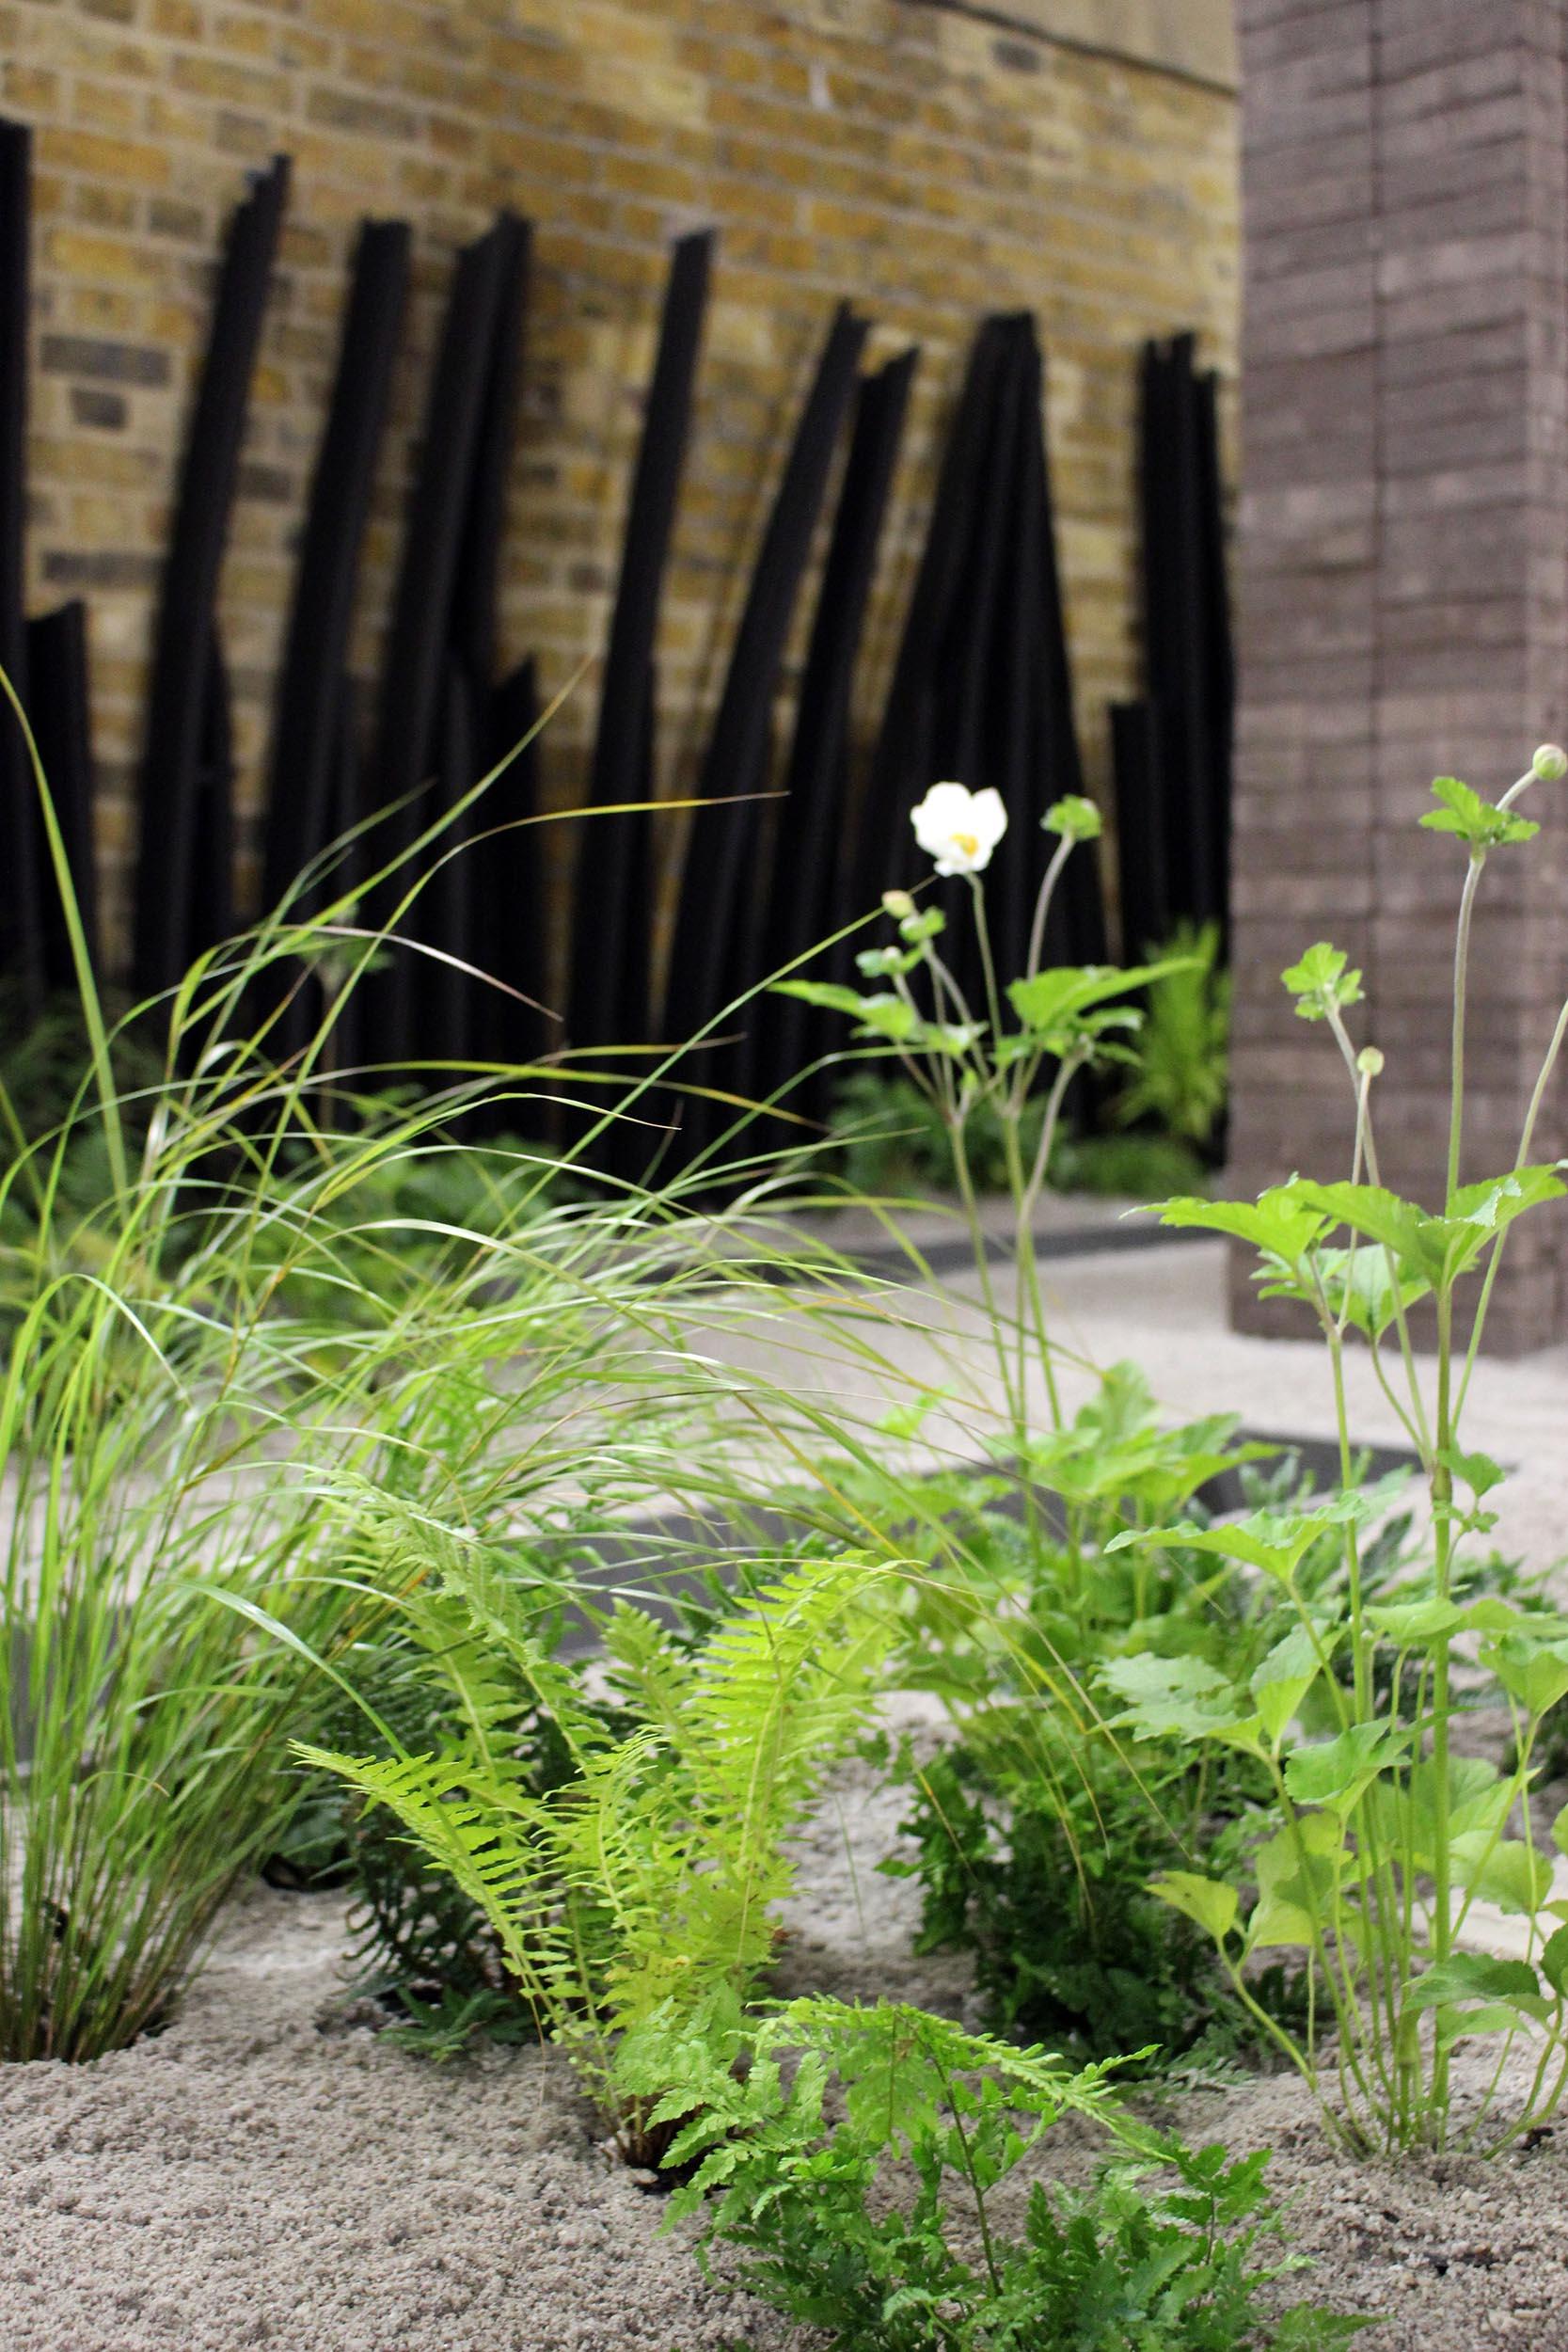 london-bridge-garden-ferns-pheasants-tail-grass.jpg